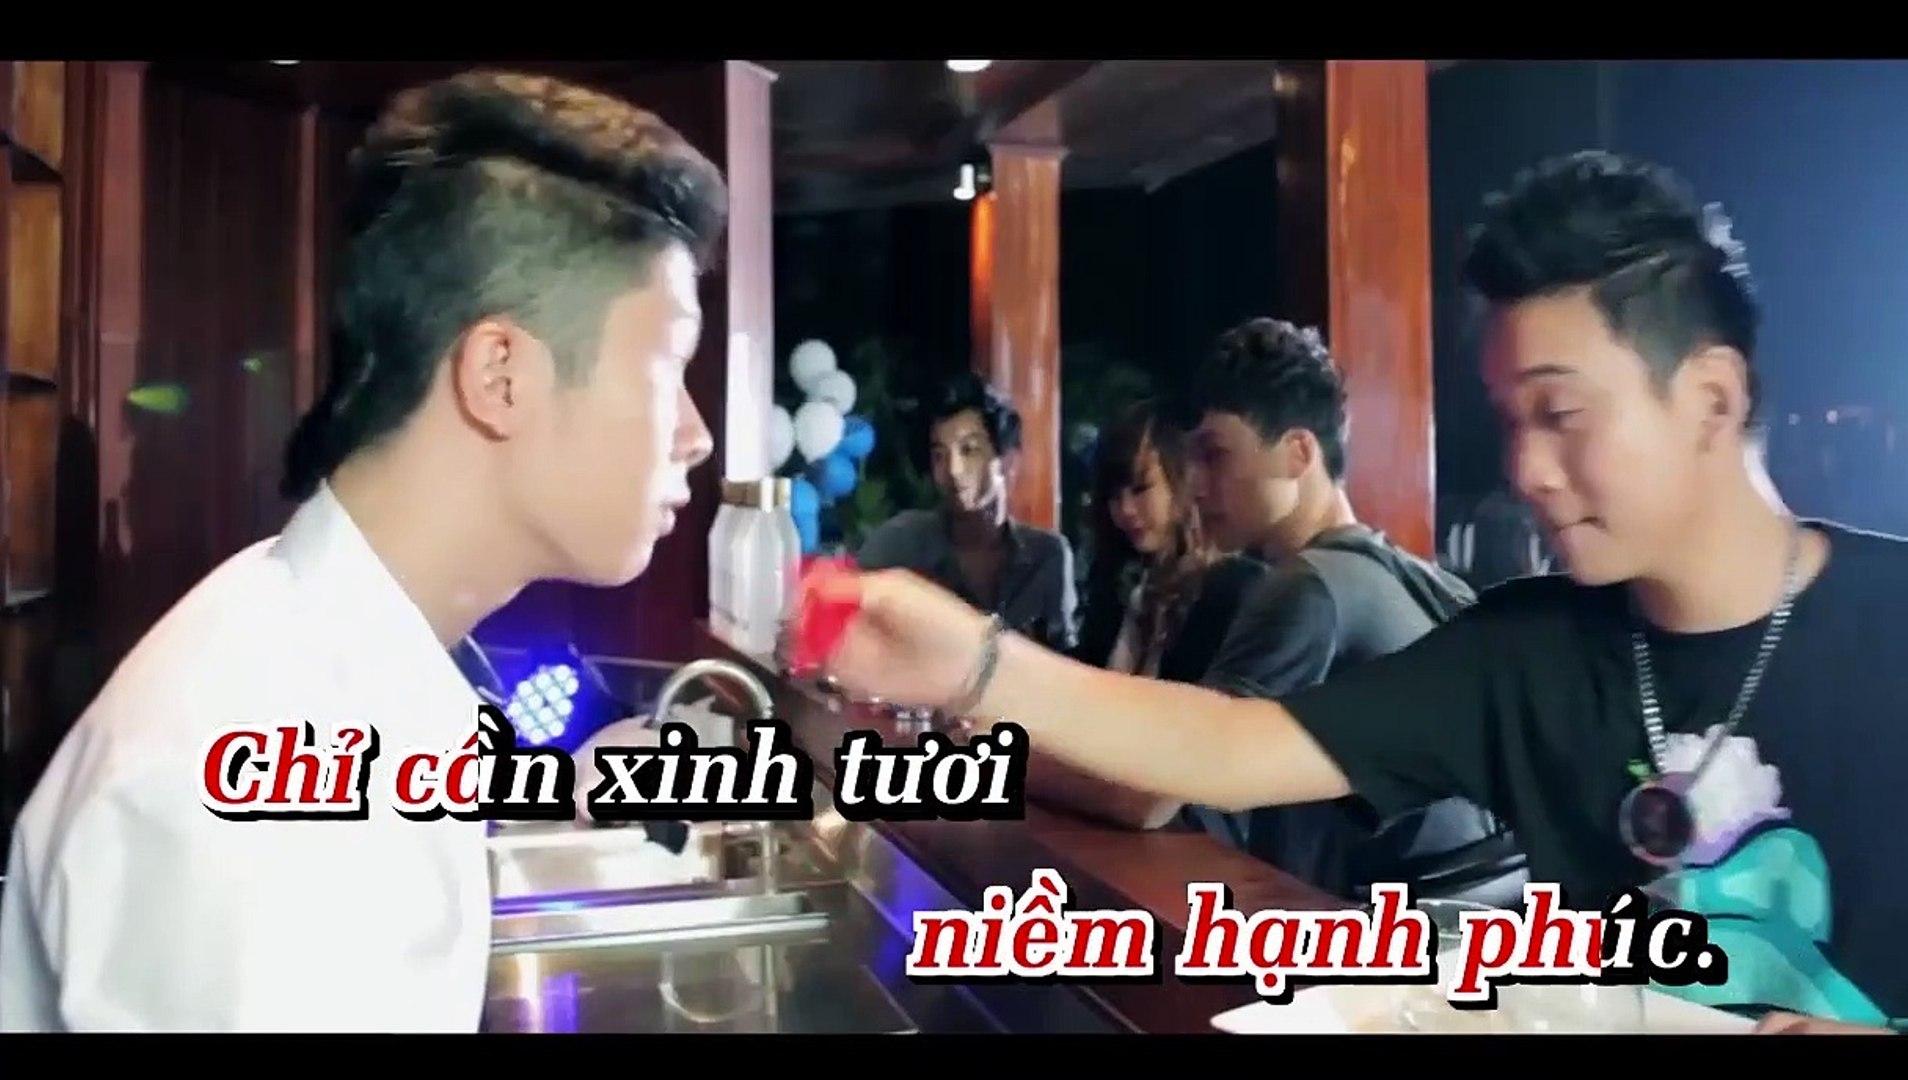 [Karaoke] Tình Cờ - Emily Ft. Lk, Justatee [Beat]